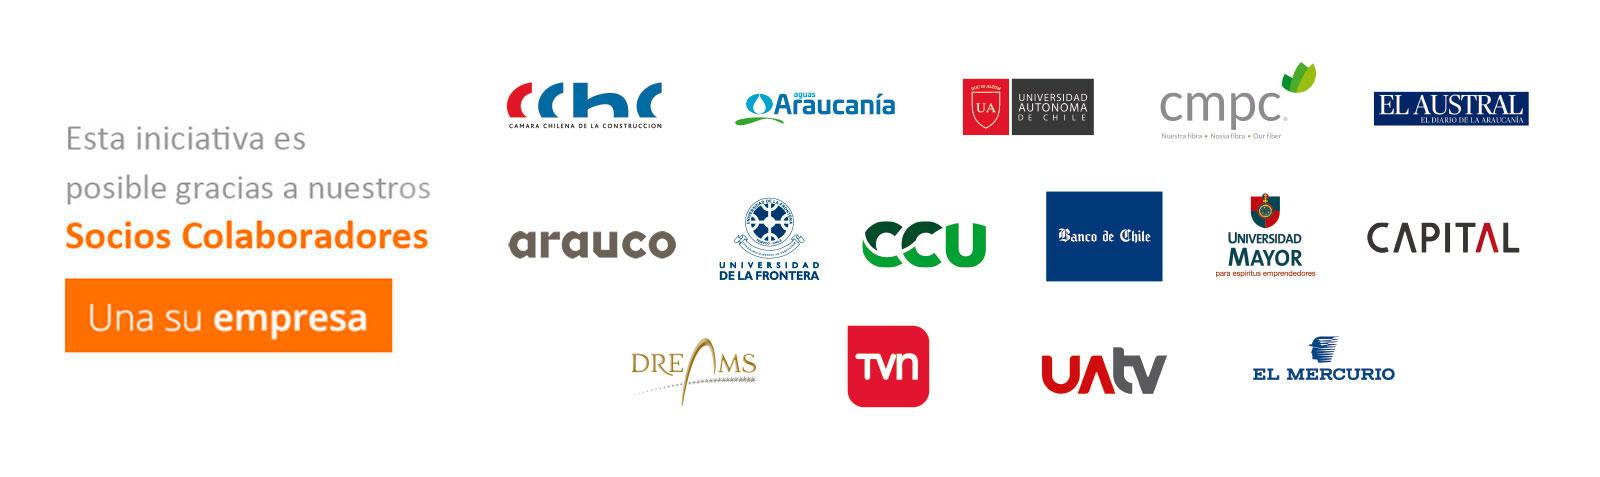 slider-logos-2020